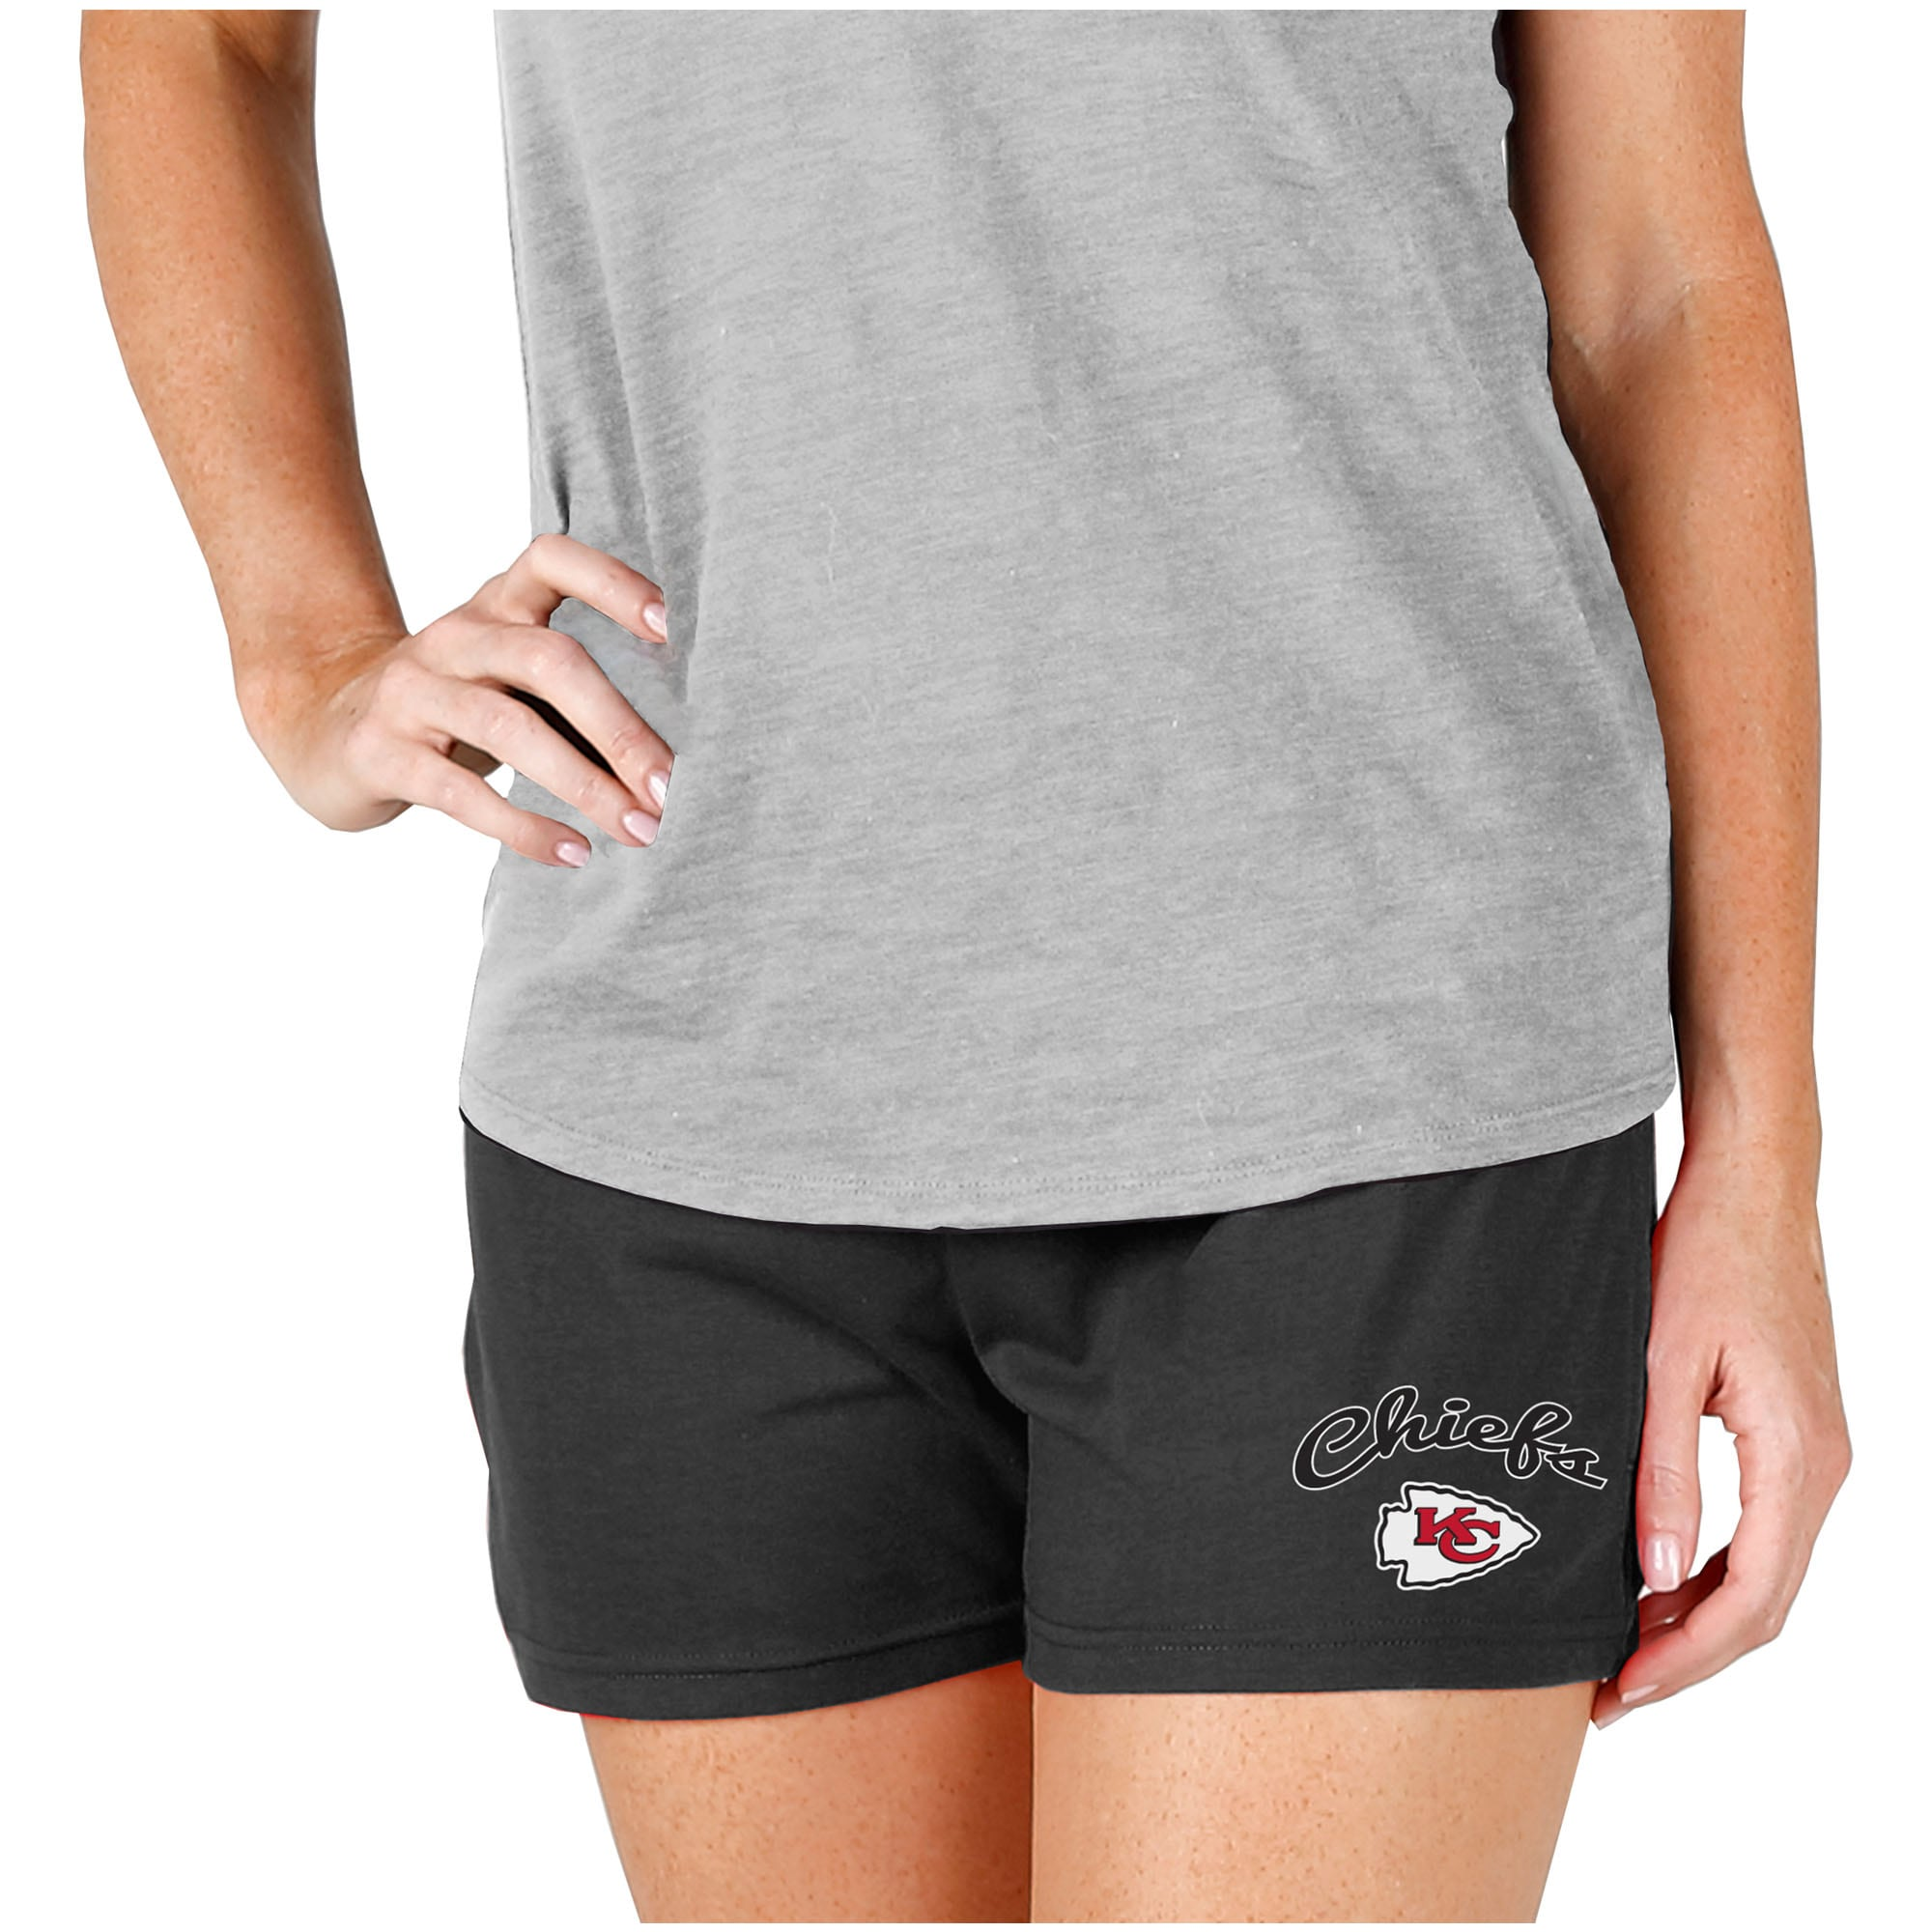 Kansas City Chiefs Concepts Sport Women's Knit Shorts - Charcoal